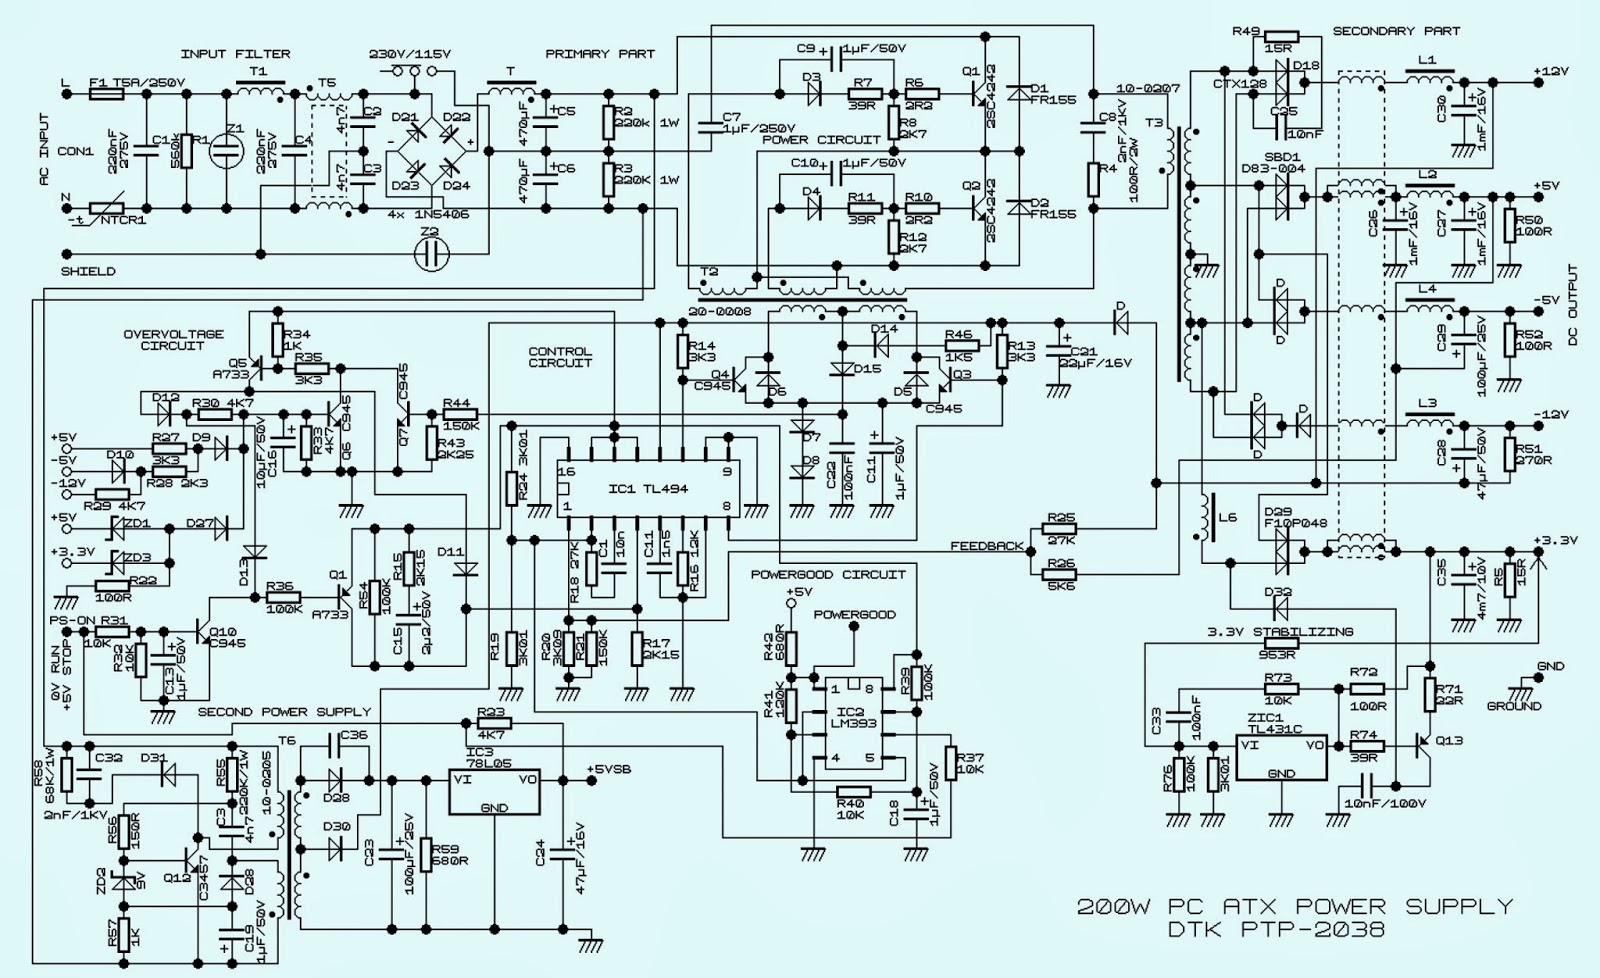 cpu wiring diagram copeland scroll circuit of computer  readingrat